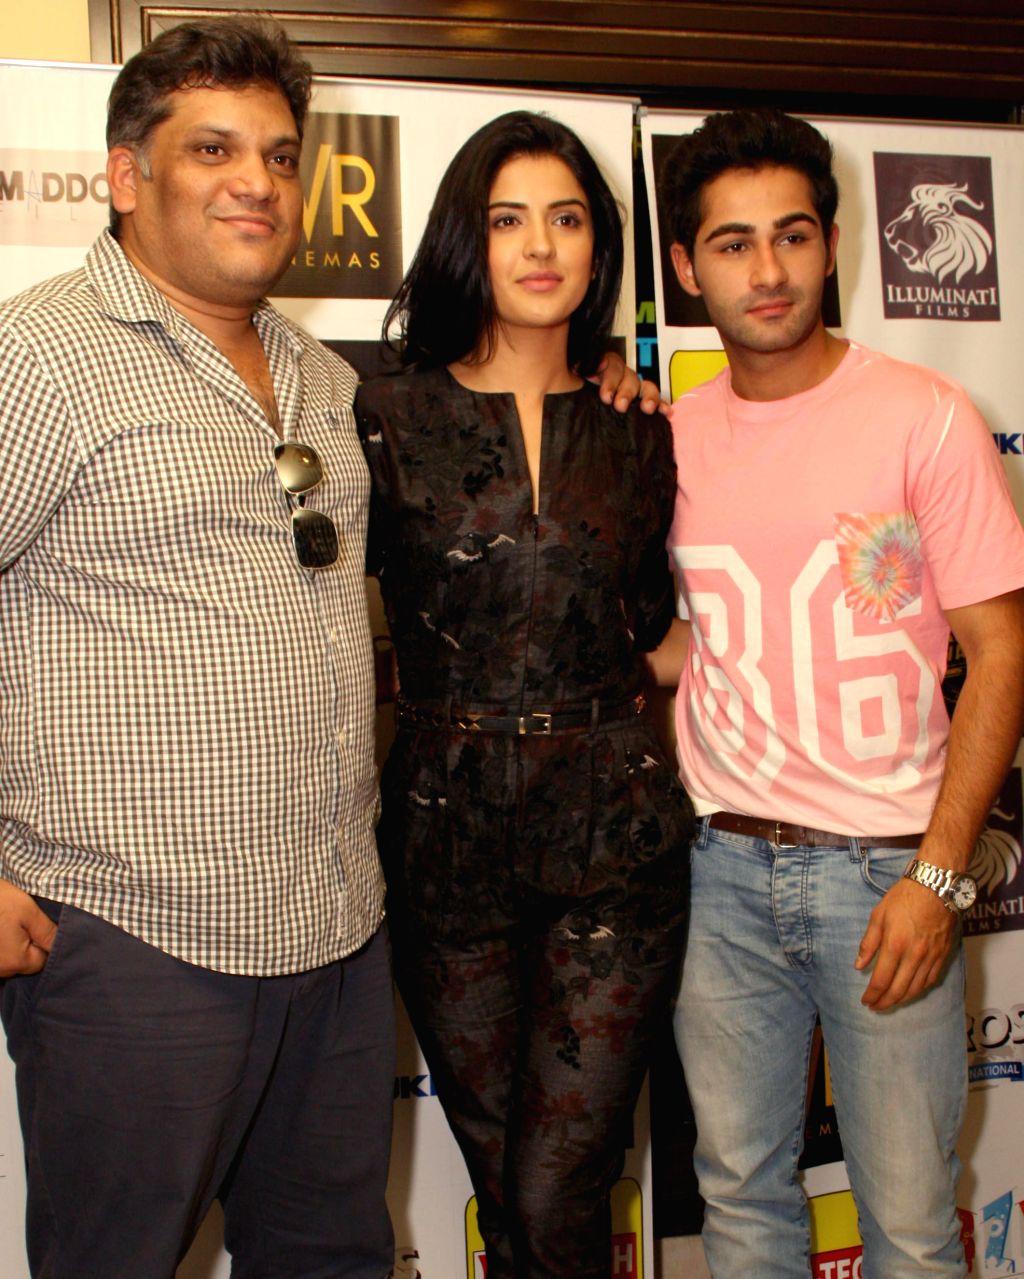 Actors Armaan Jain and Deeksha Seth with filmmaker Arif Ali during a press conference to promote their upcoming film `Lekar Hum Deewana Dil` in New Delhi on July 1, 2014. - Armaan Jain and Deeksha Seth